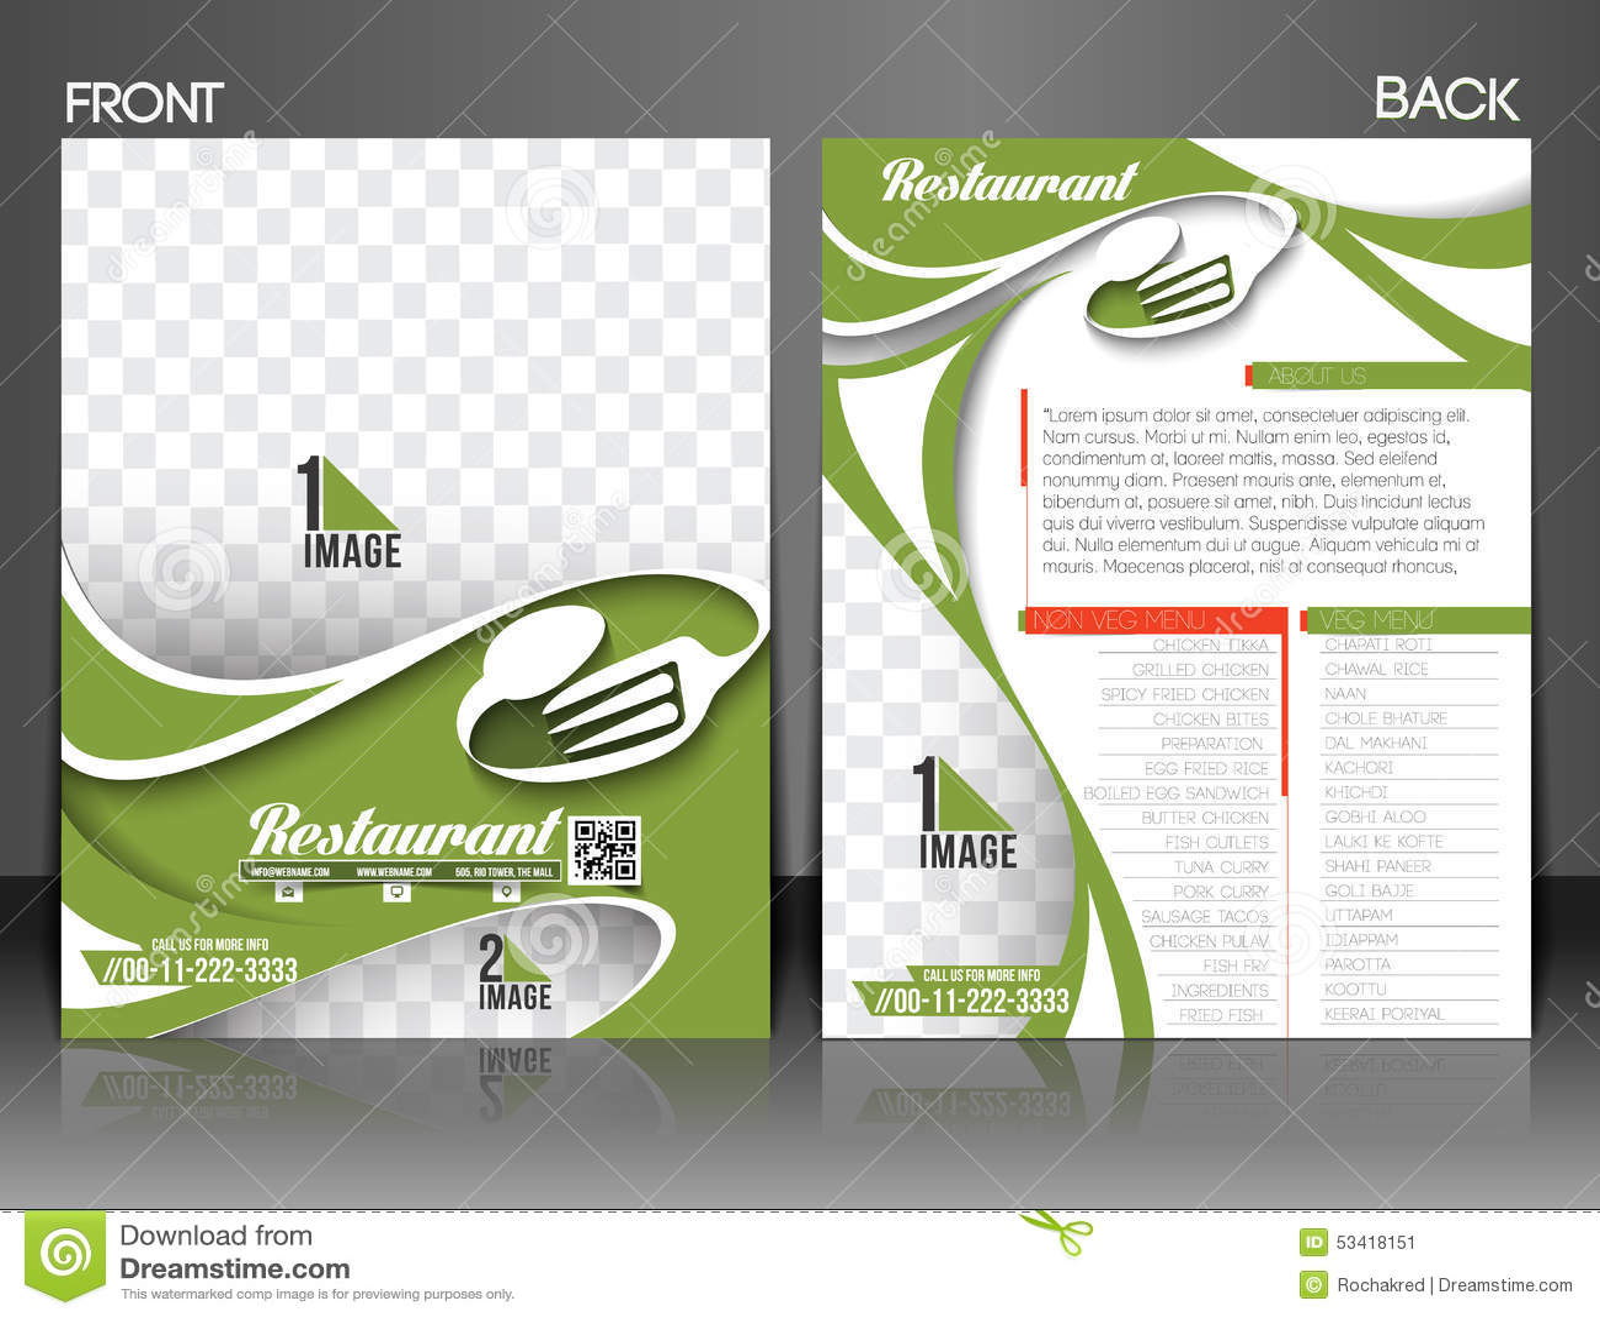 referral program flyer template